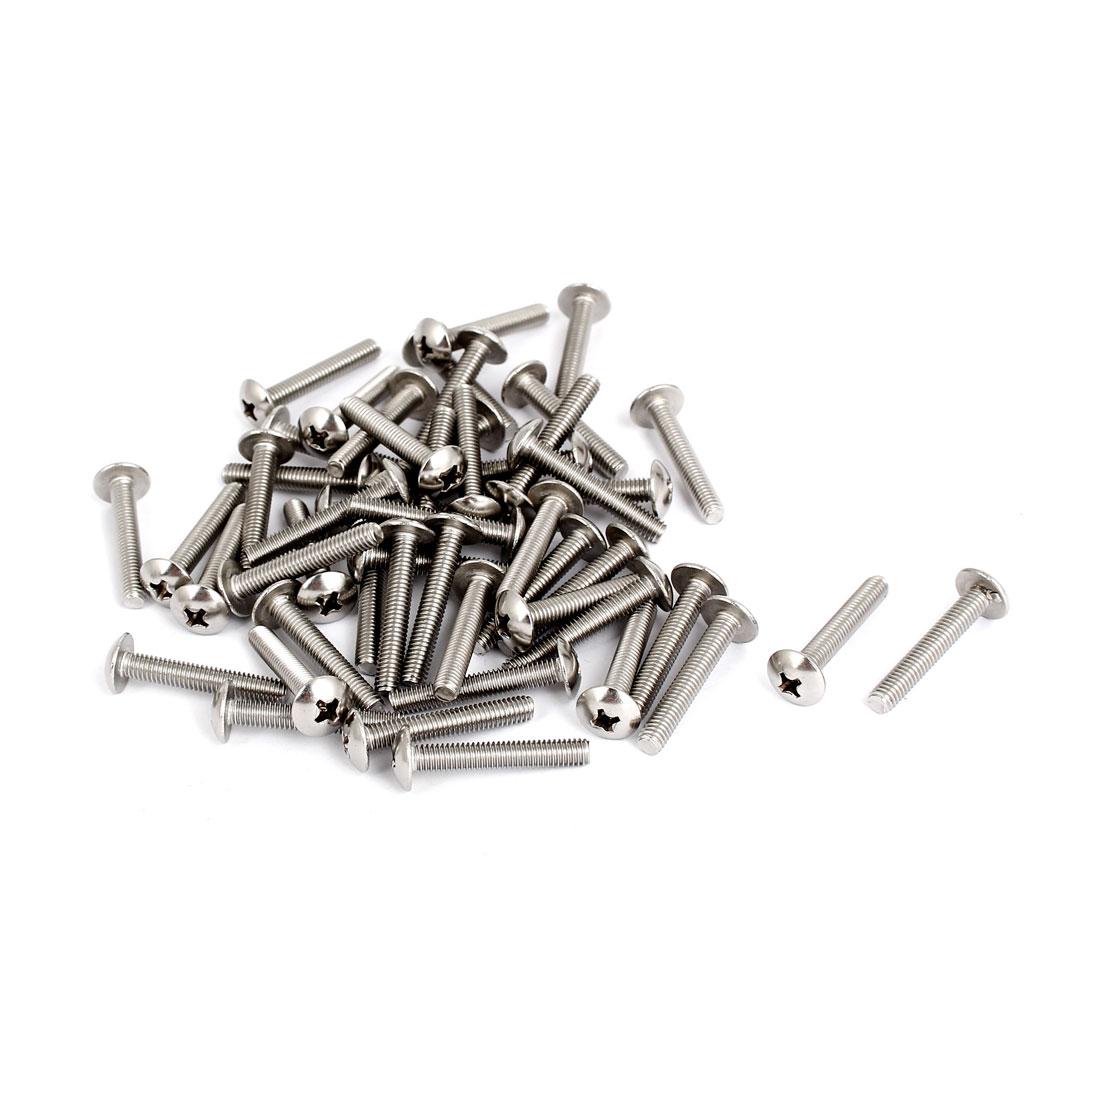 M4x25mm Stainless Steel Truss Phillips Head Machine Screws 50pcs